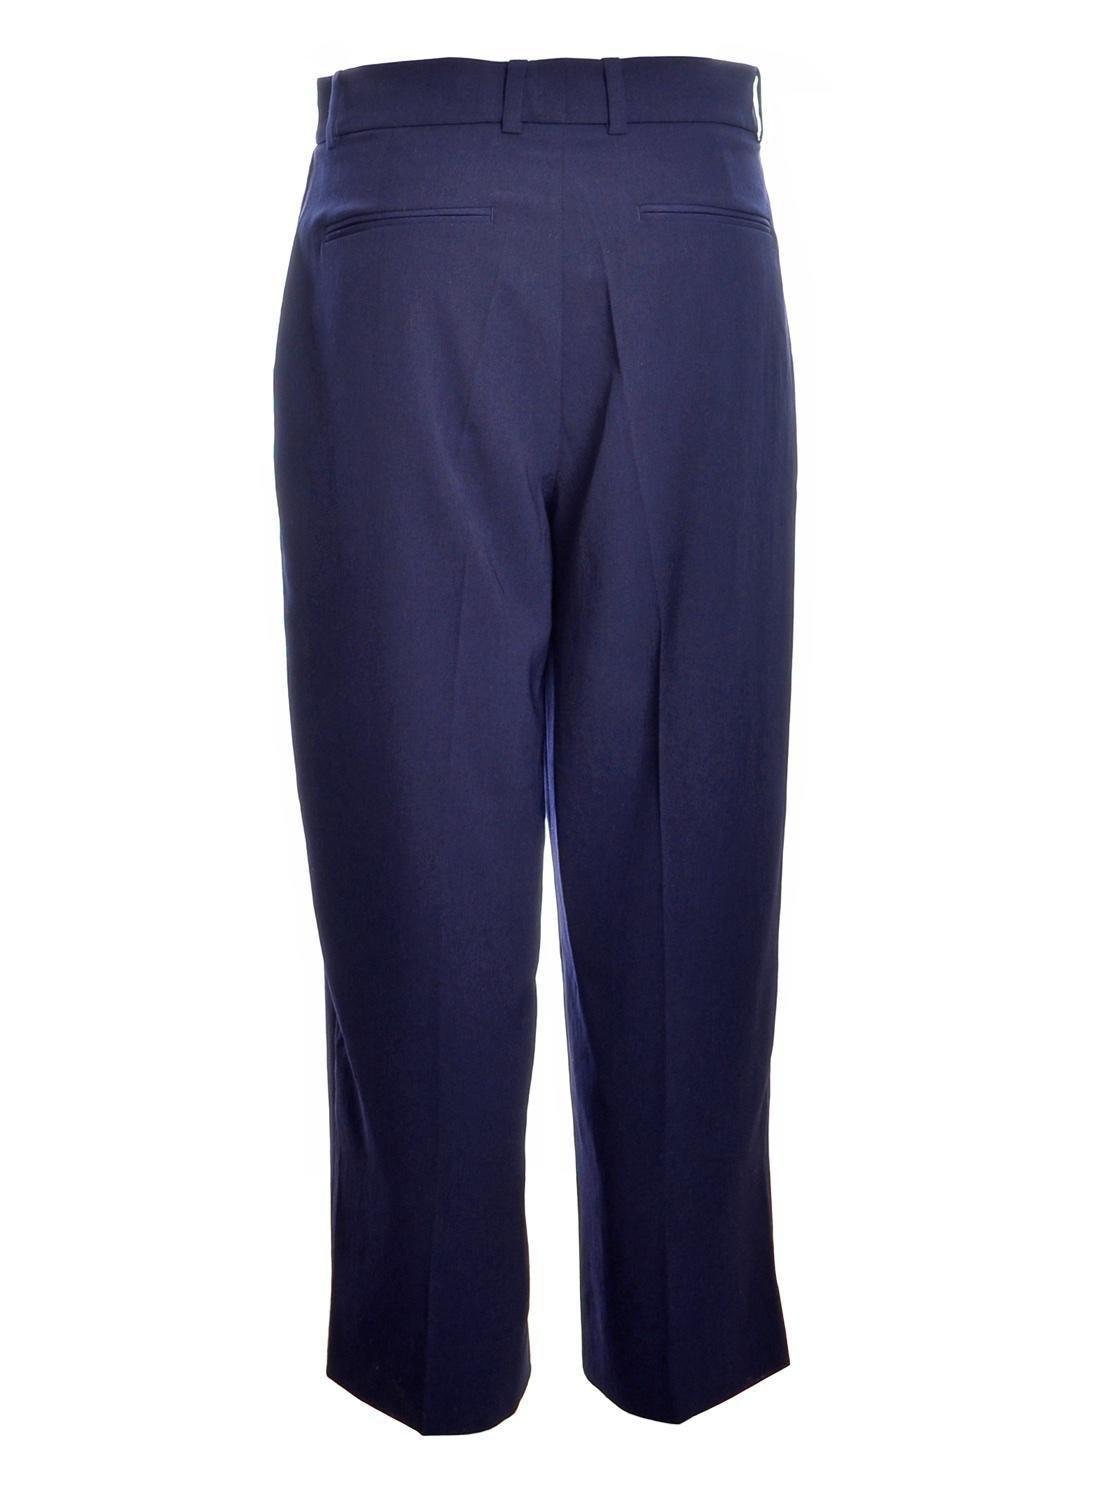 Lyst - Folk Wide Tailored Trousers In Navy